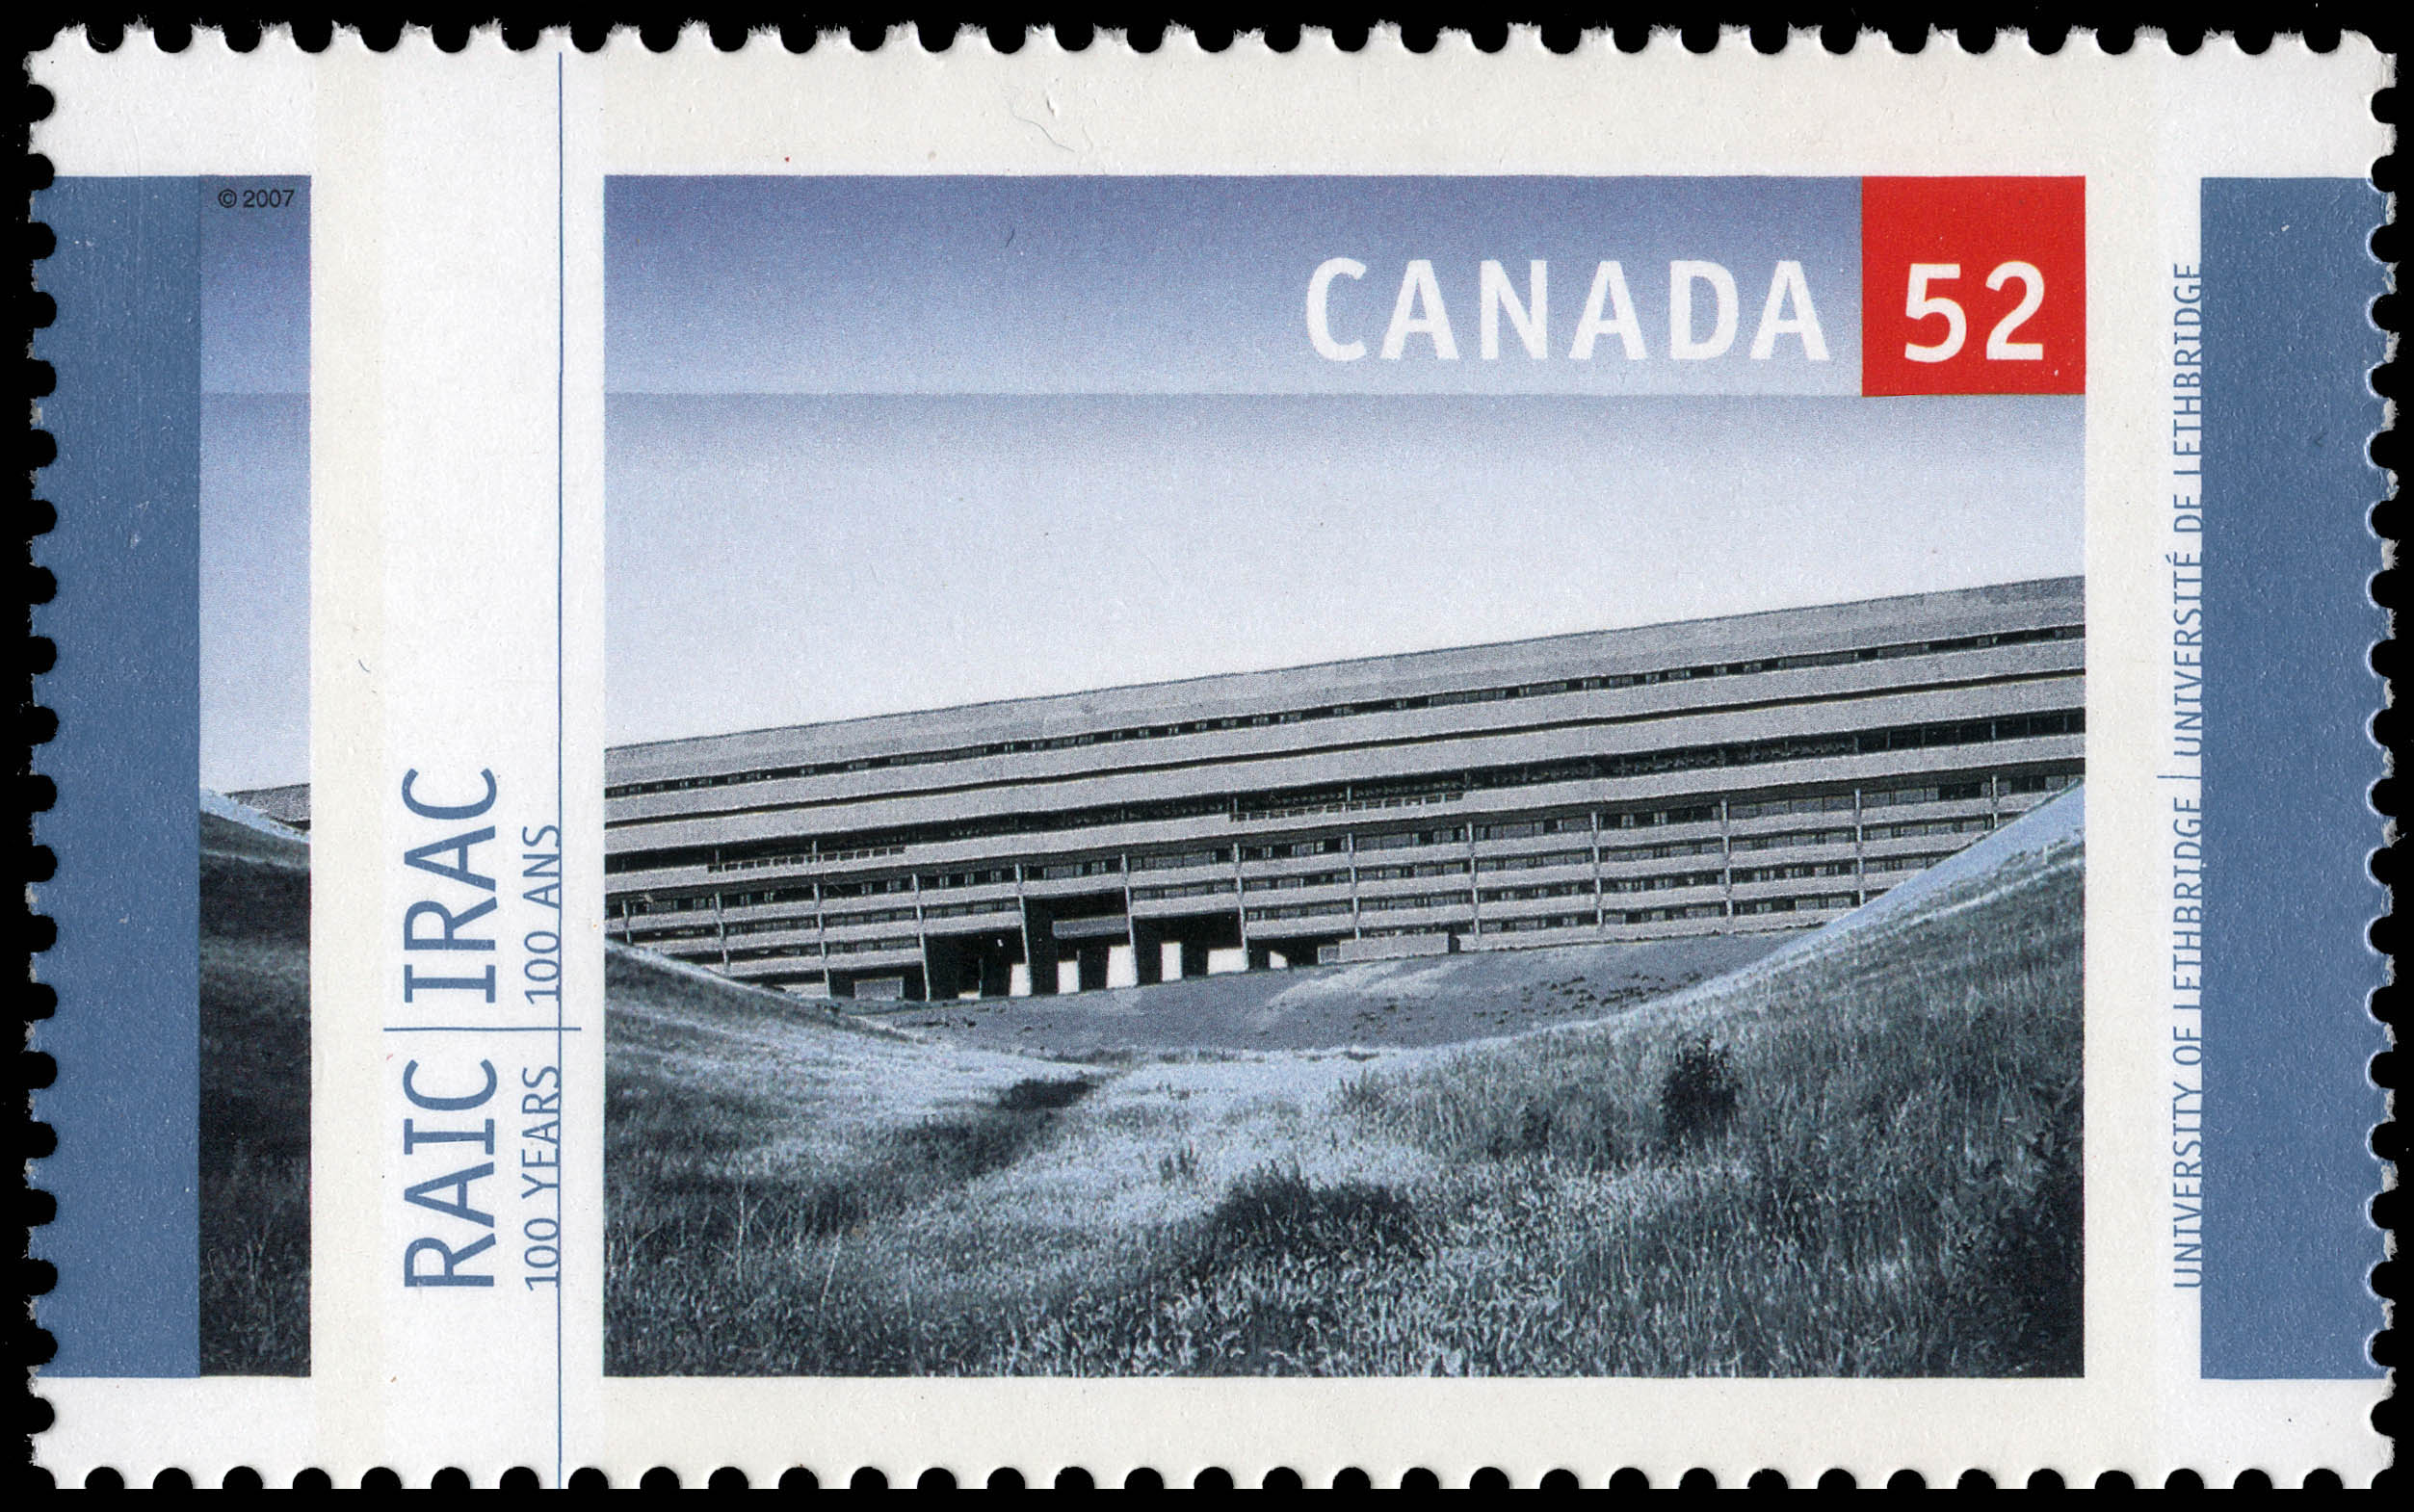 Universiy of Lethbridge Canada Postage Stamp